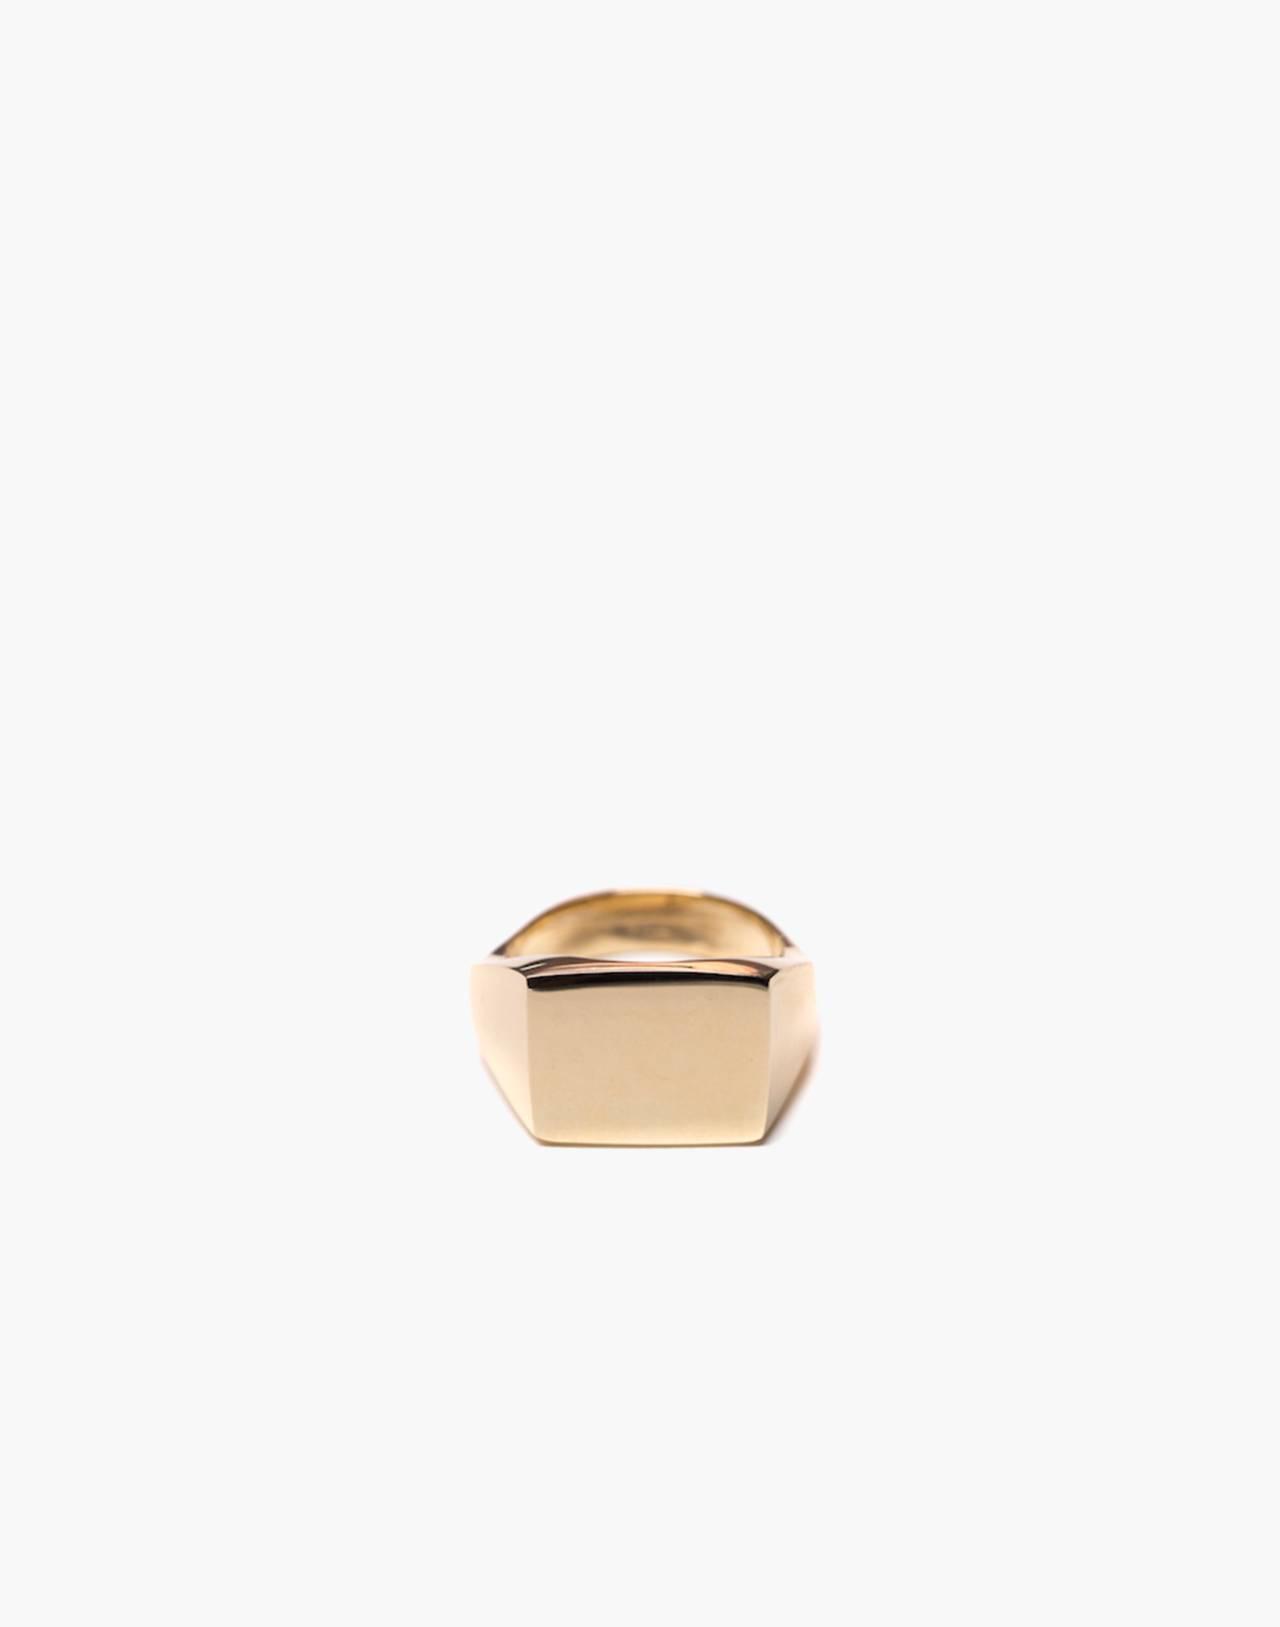 Charlotte Cauwe Studio Brass Delicate Signet Ring in gold image 2